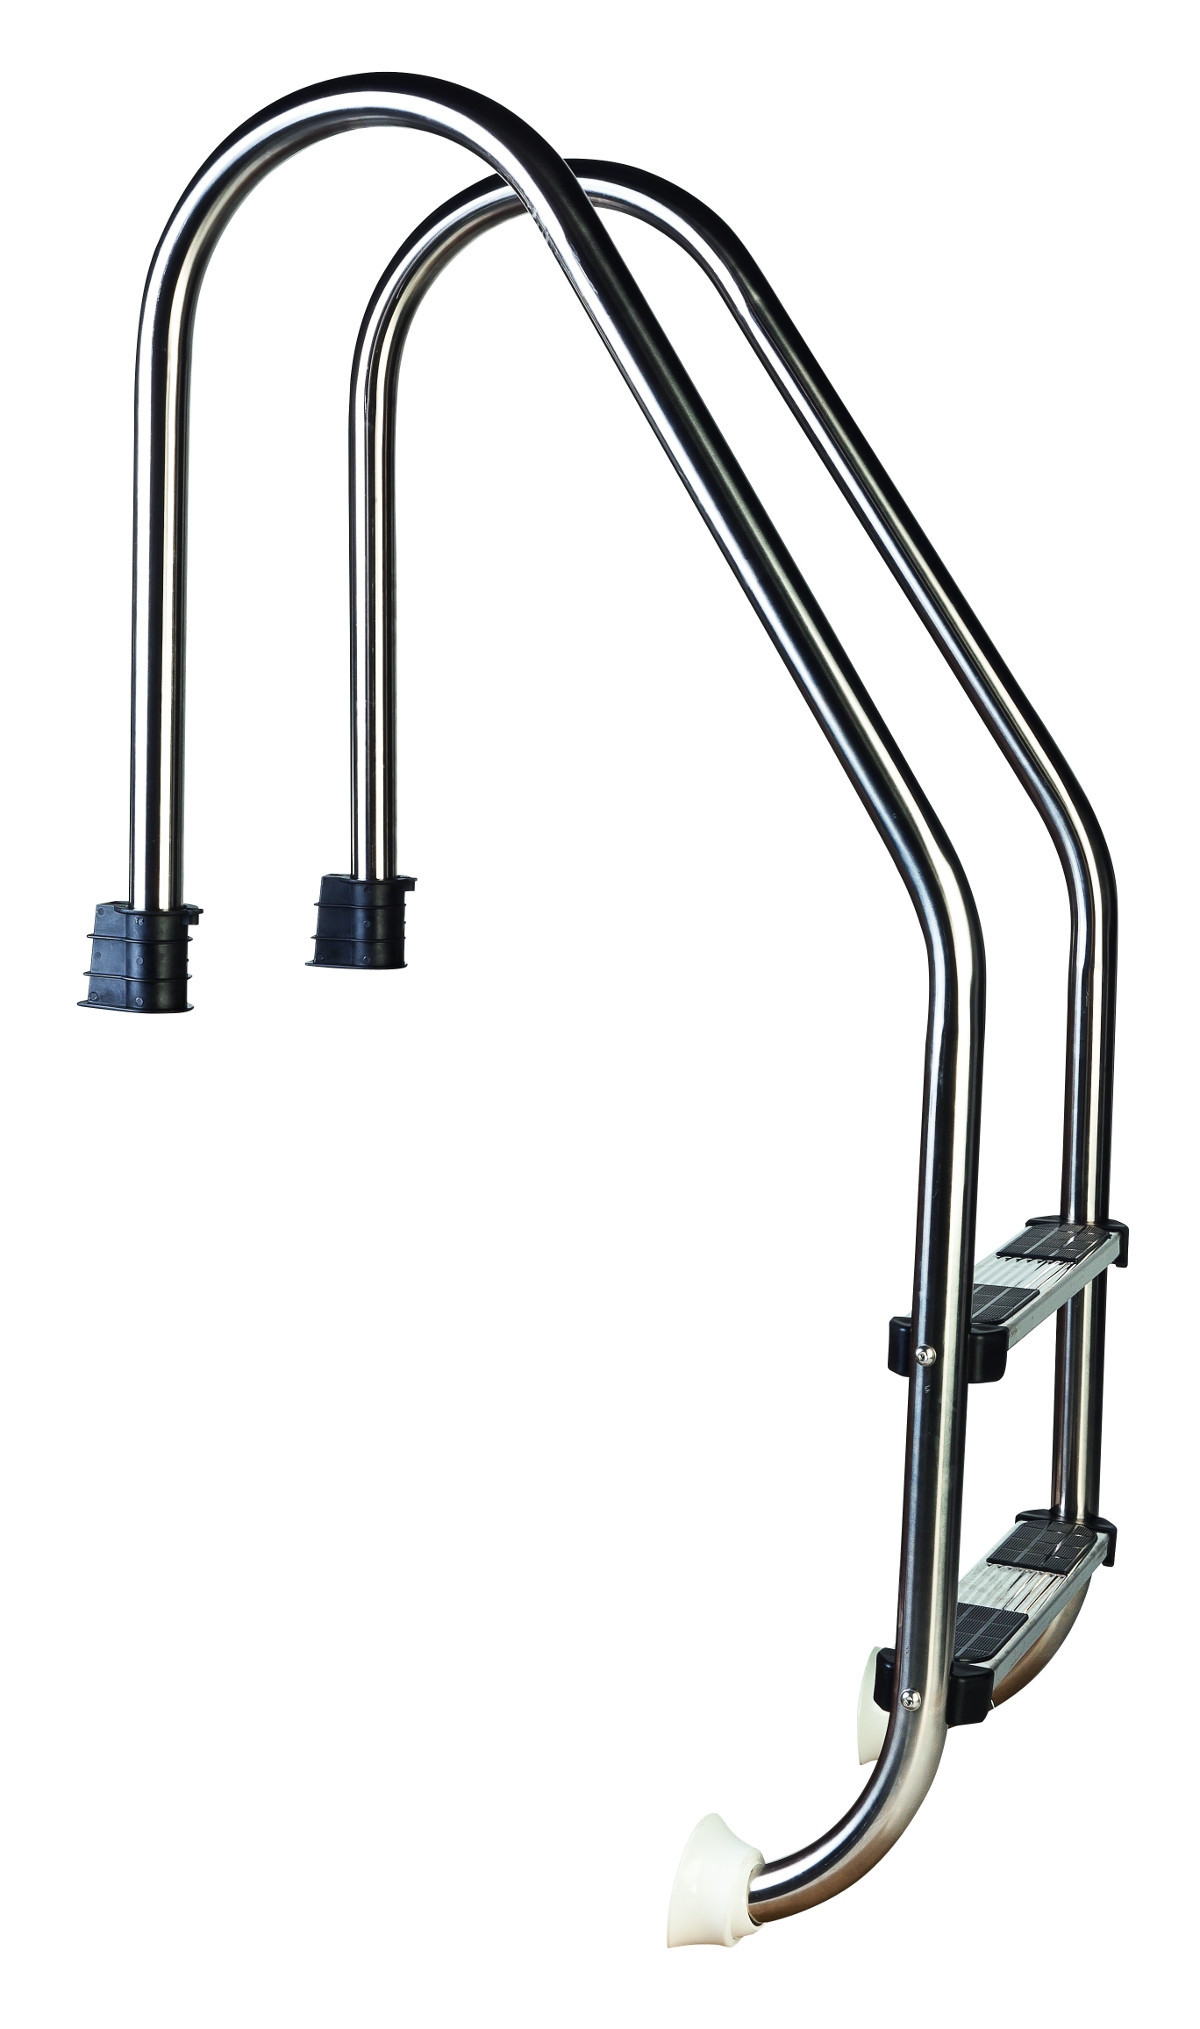 Лестница Mountfield Standard для бассейнов Azuro / Ibiza 2 ступени, арт. 3EXX0083[3BPZ0137]